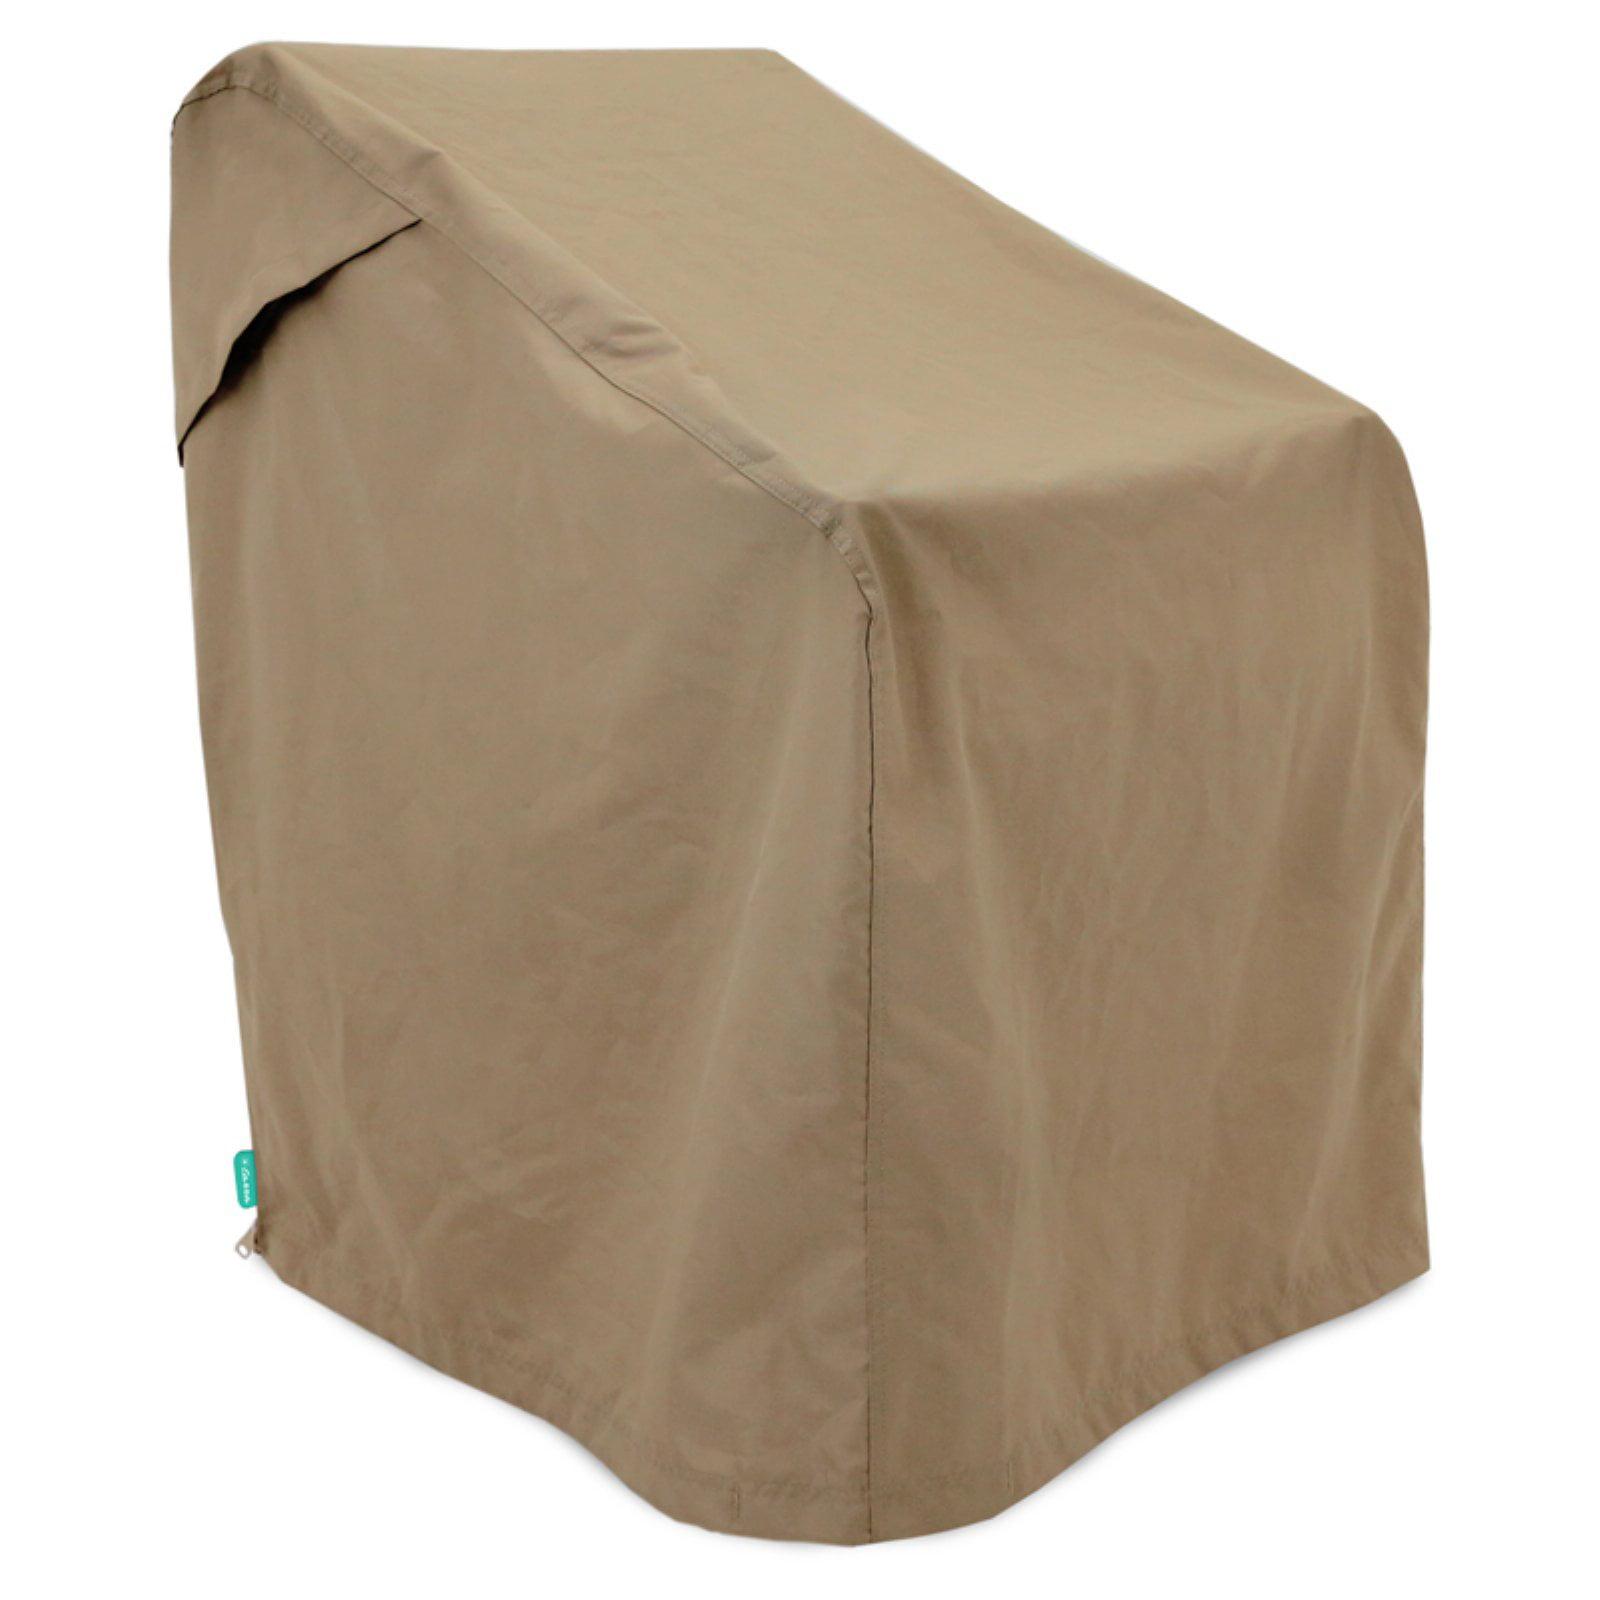 Tarra Home Universal Outdoor UFCCP263435PT Patio Chair Cover